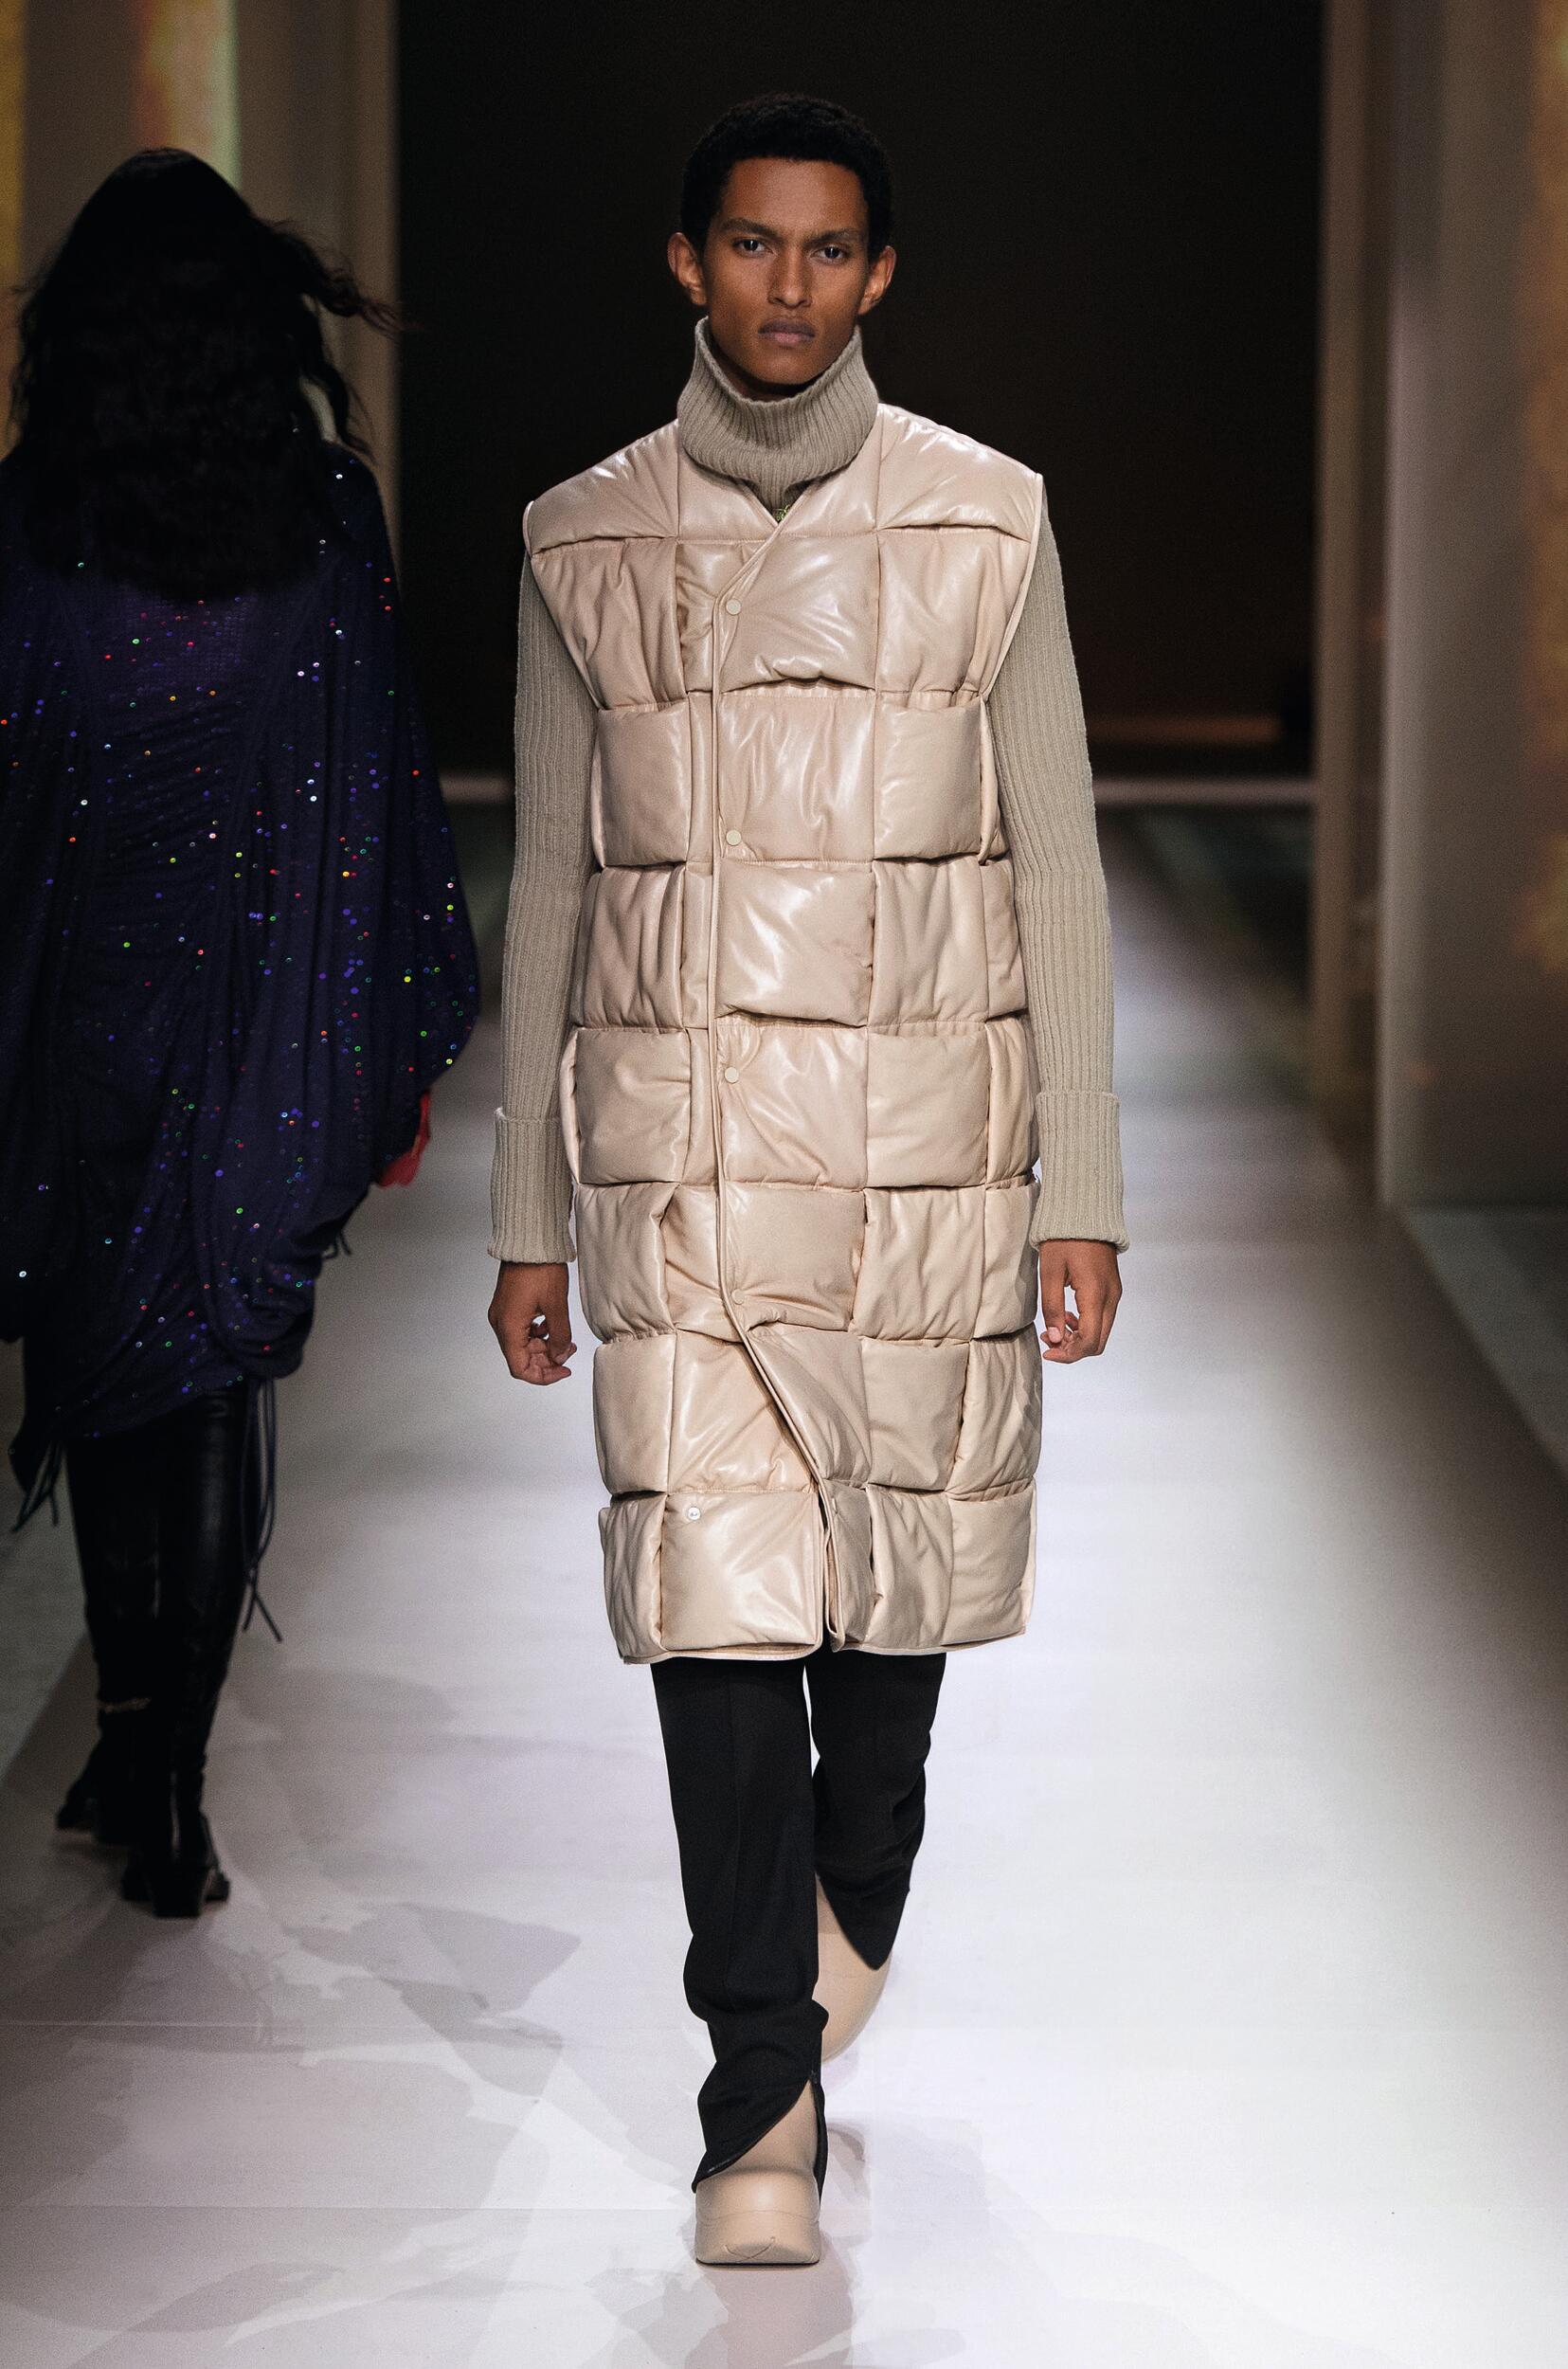 2020 Bottega Veneta Fall Catwalk